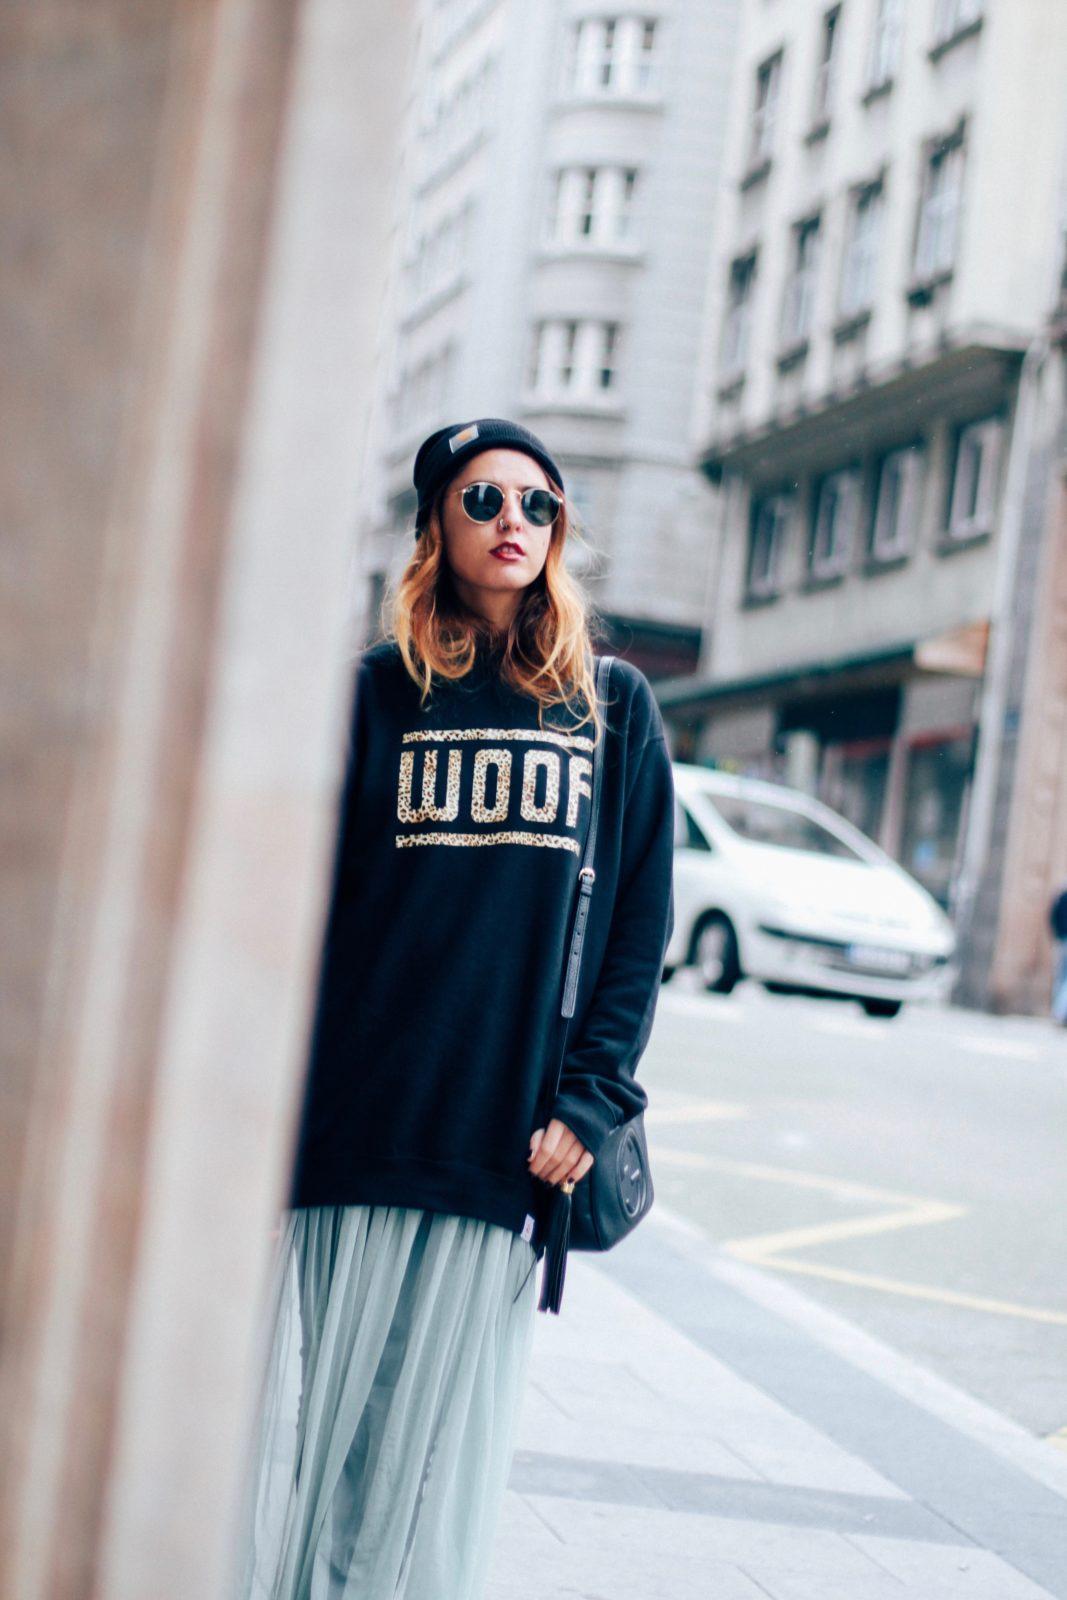 sudadera_old_dogs_falda_de_tul_vans_beanie_carhartt_look_donkeycool_street_style-11